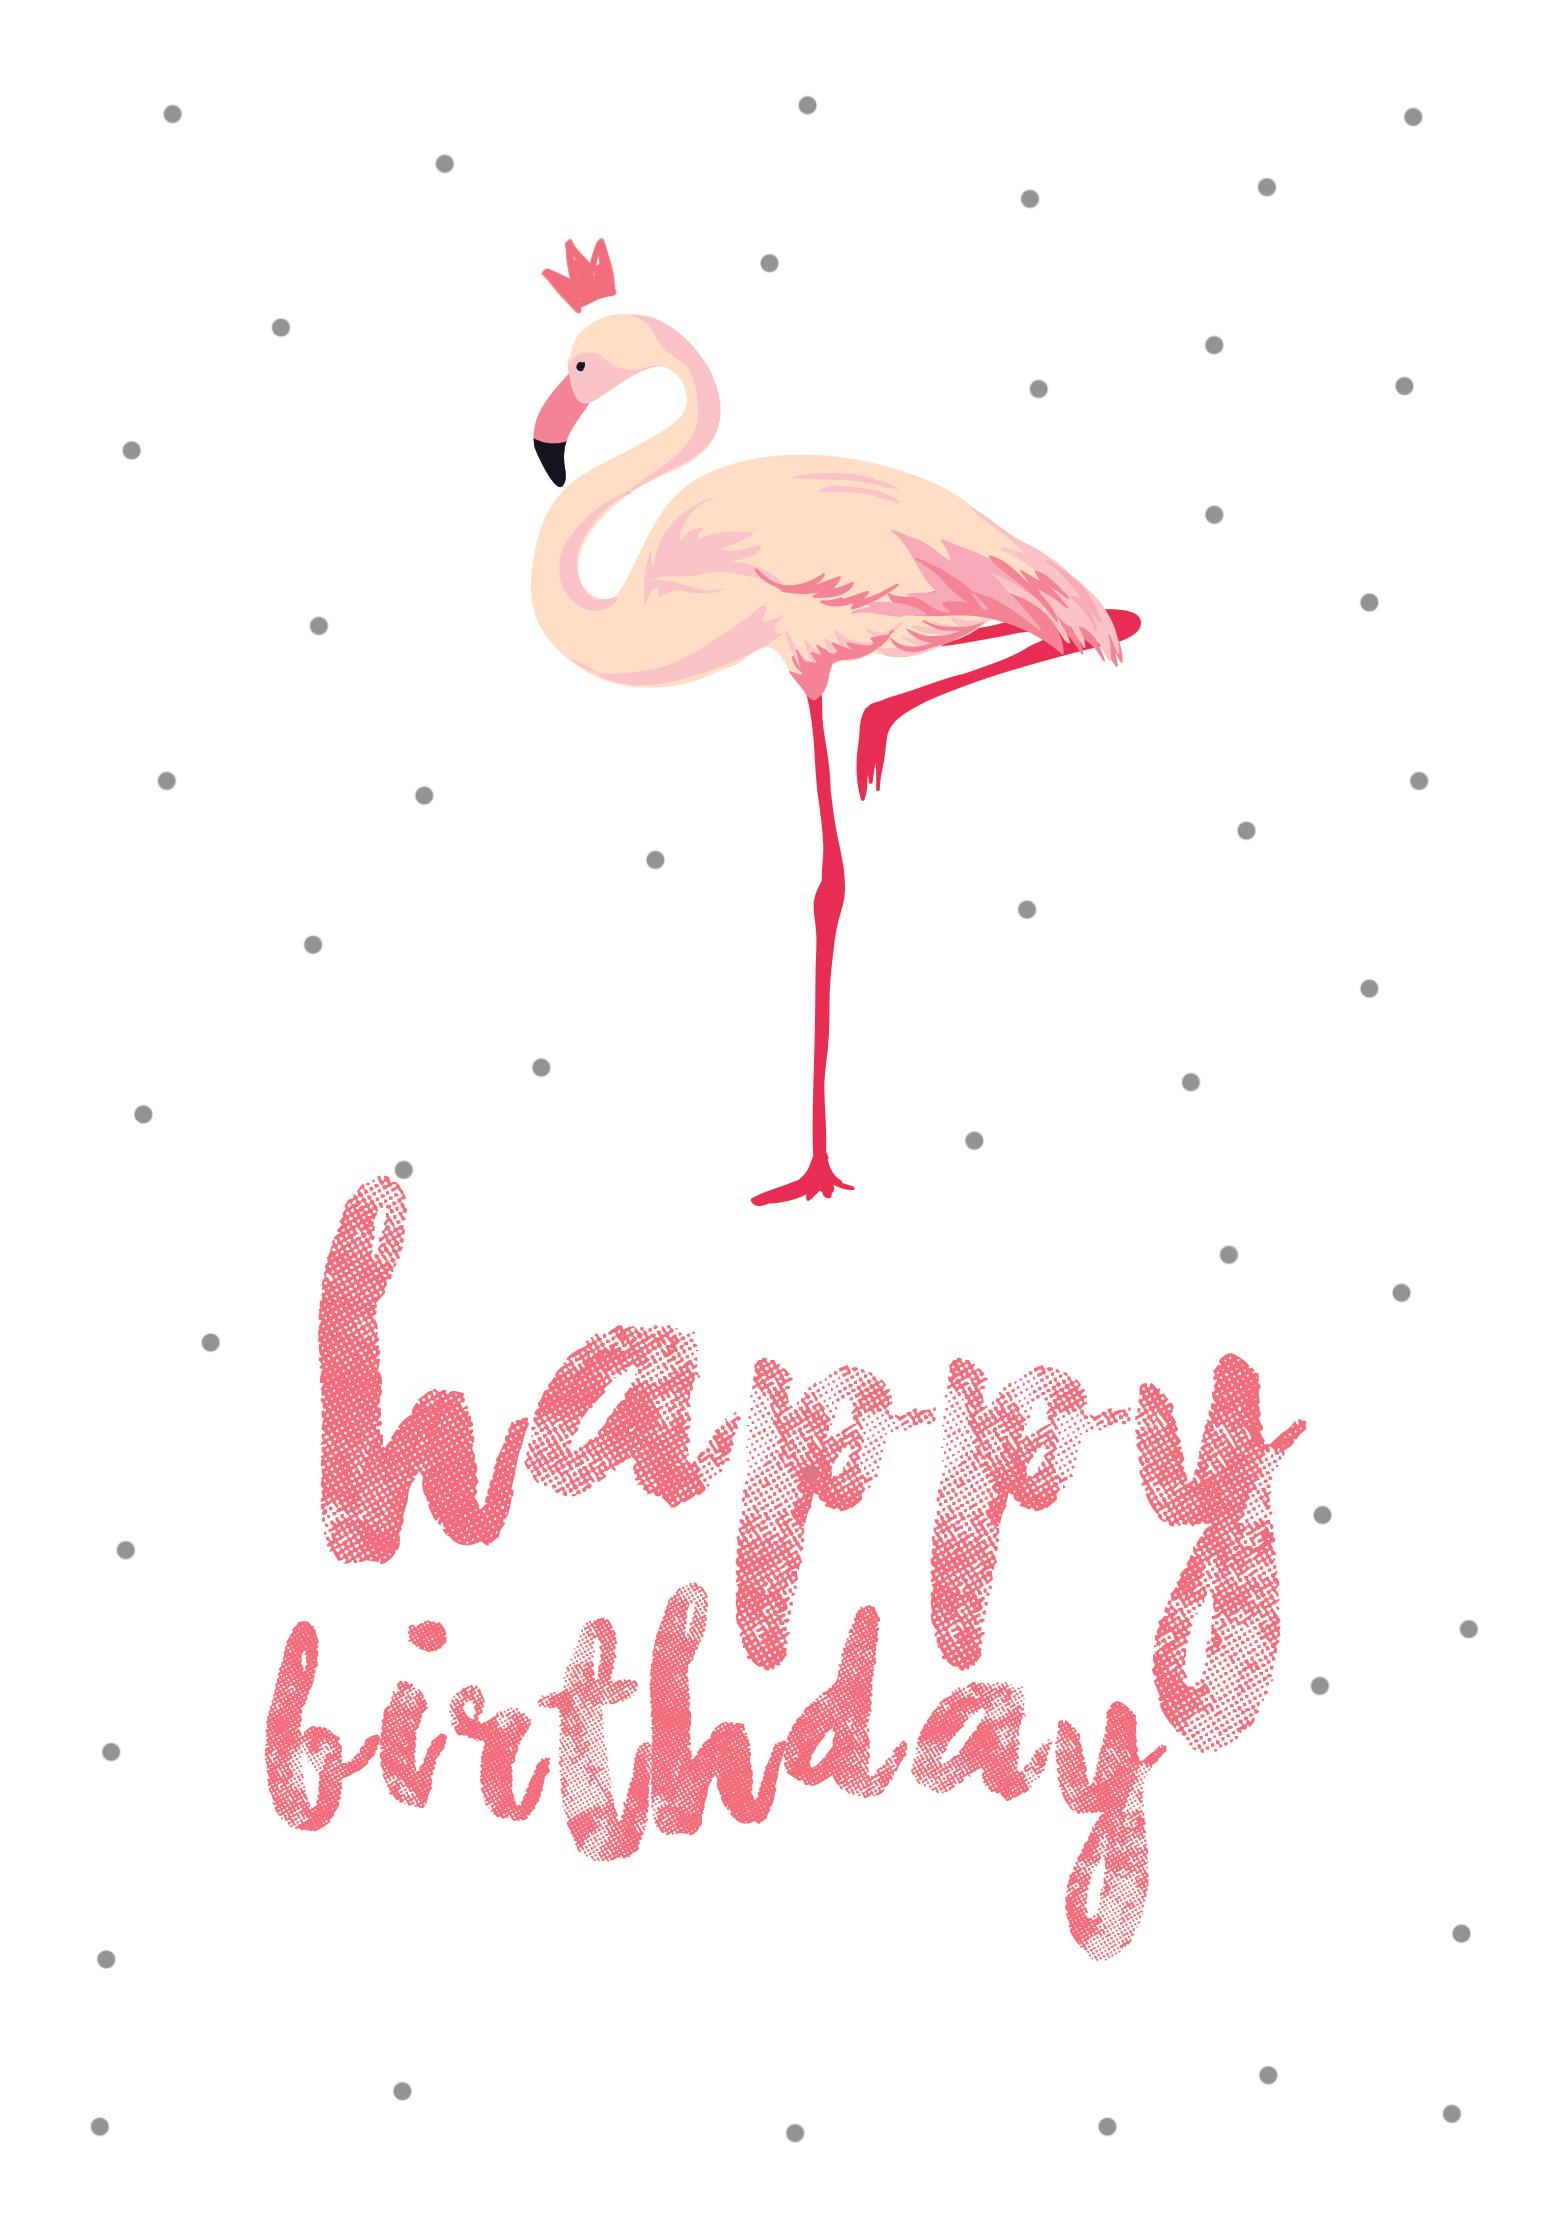 Flamingo Birthday - Free Printable Birthday Card | Greetings Island - Free Printable Greeting Cards No Sign Up